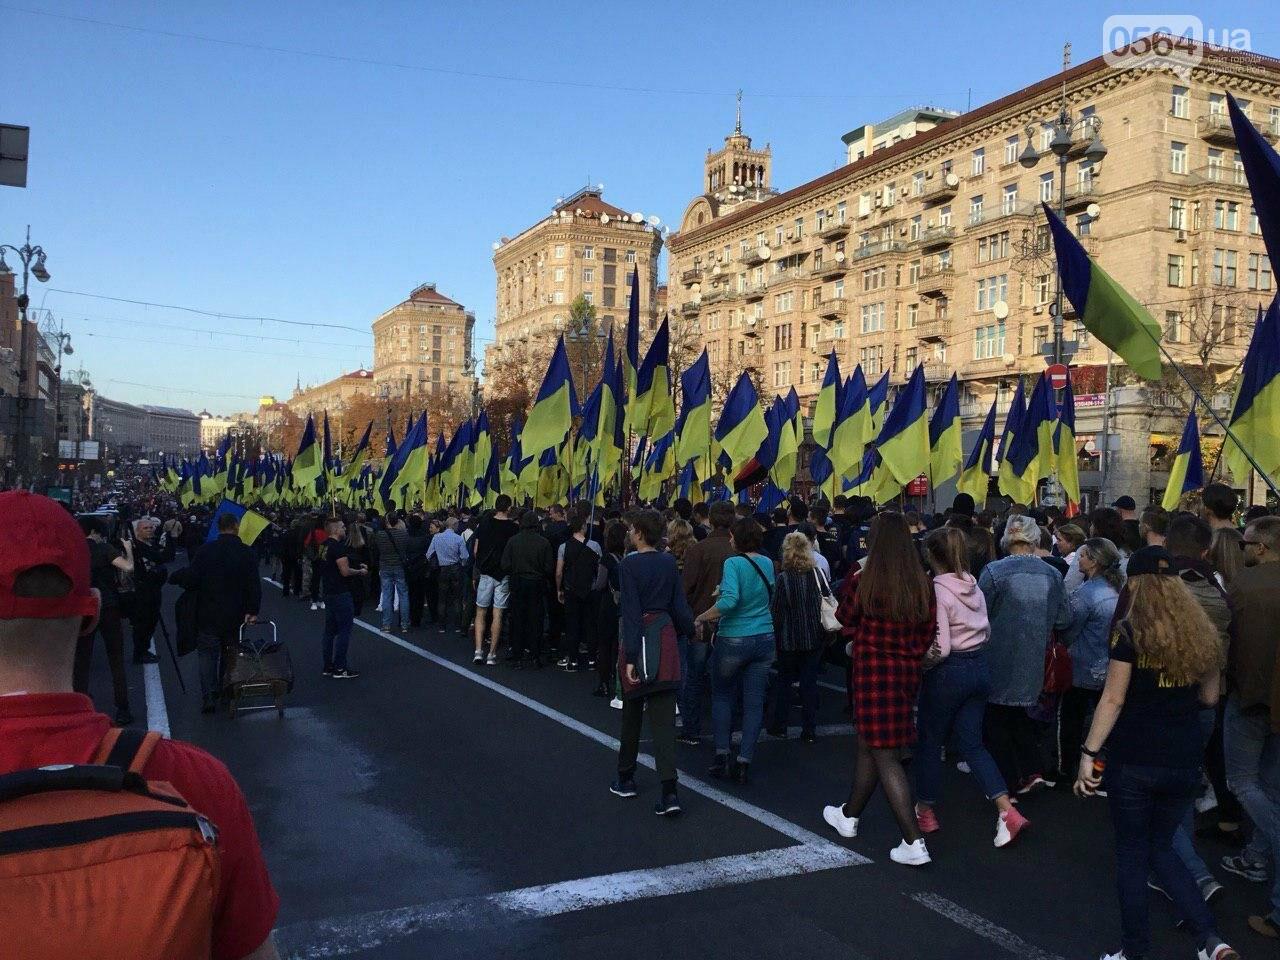 Криворожане поддержали Марш сопротивления капитуляции в Киеве, - ФОТО, ВИДЕО, ОБНОВЛЕНО, фото-3